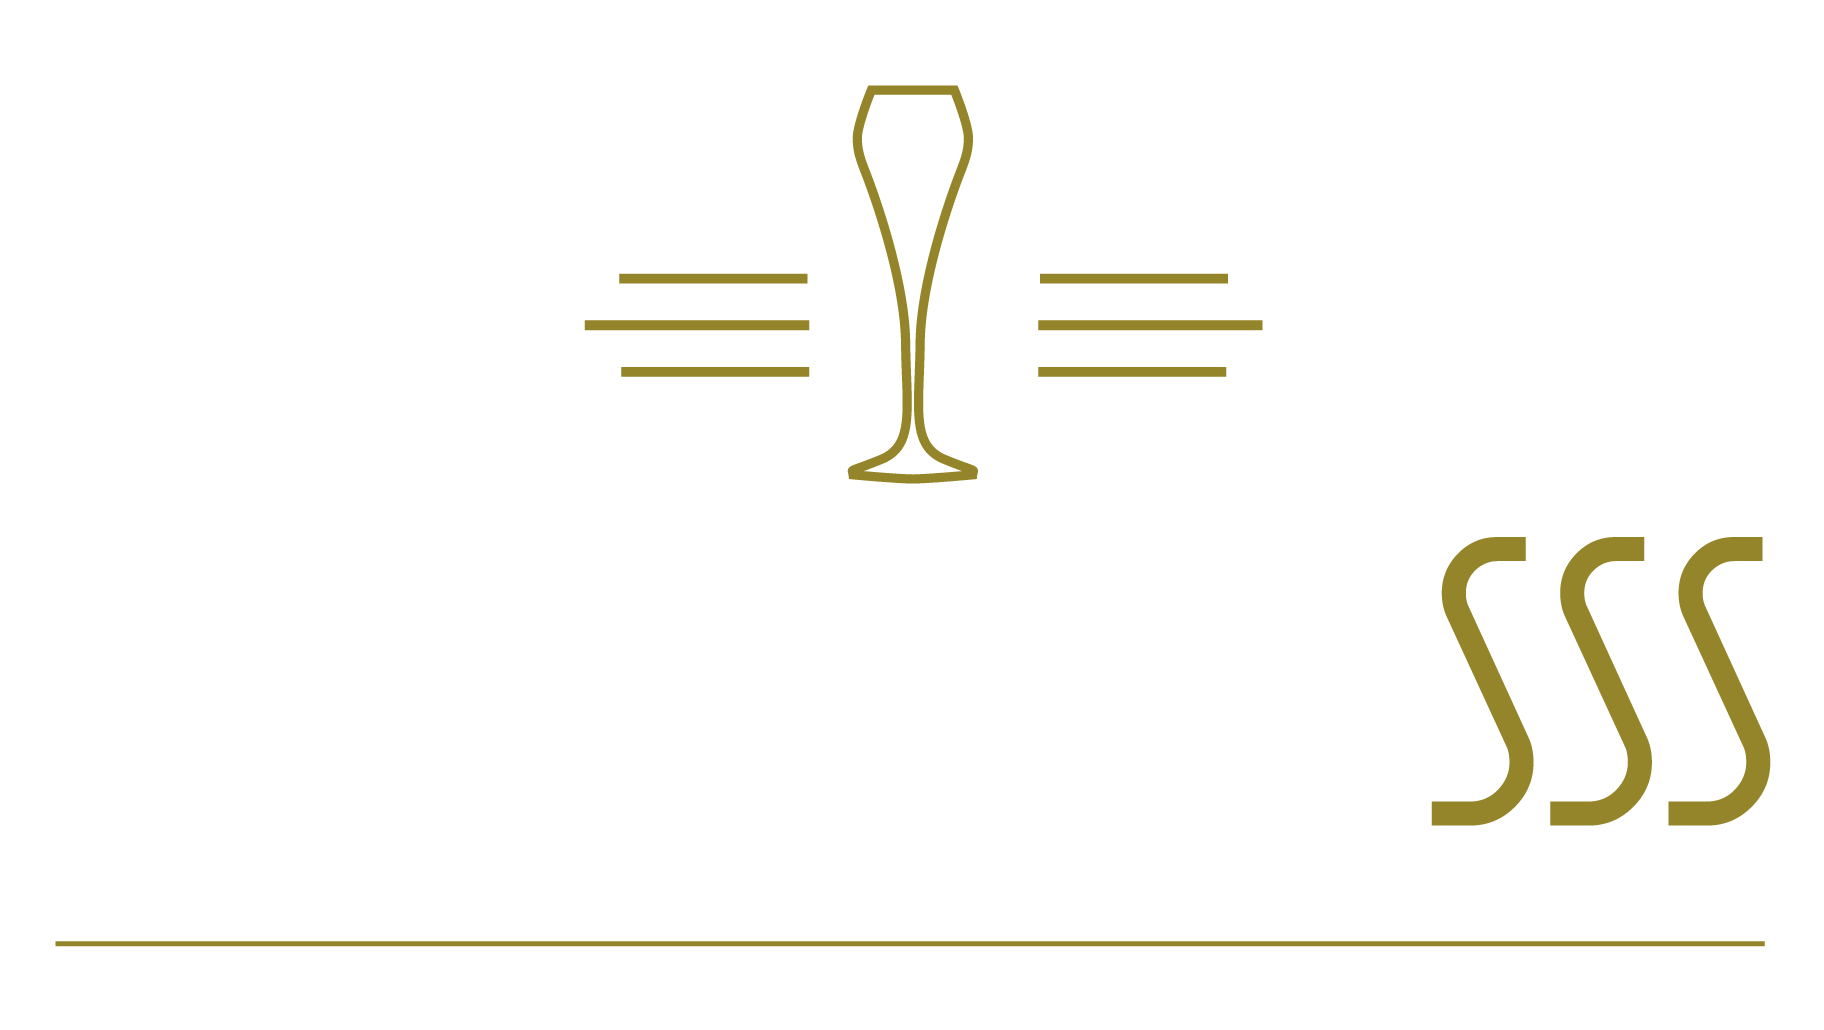 logo champagnesss